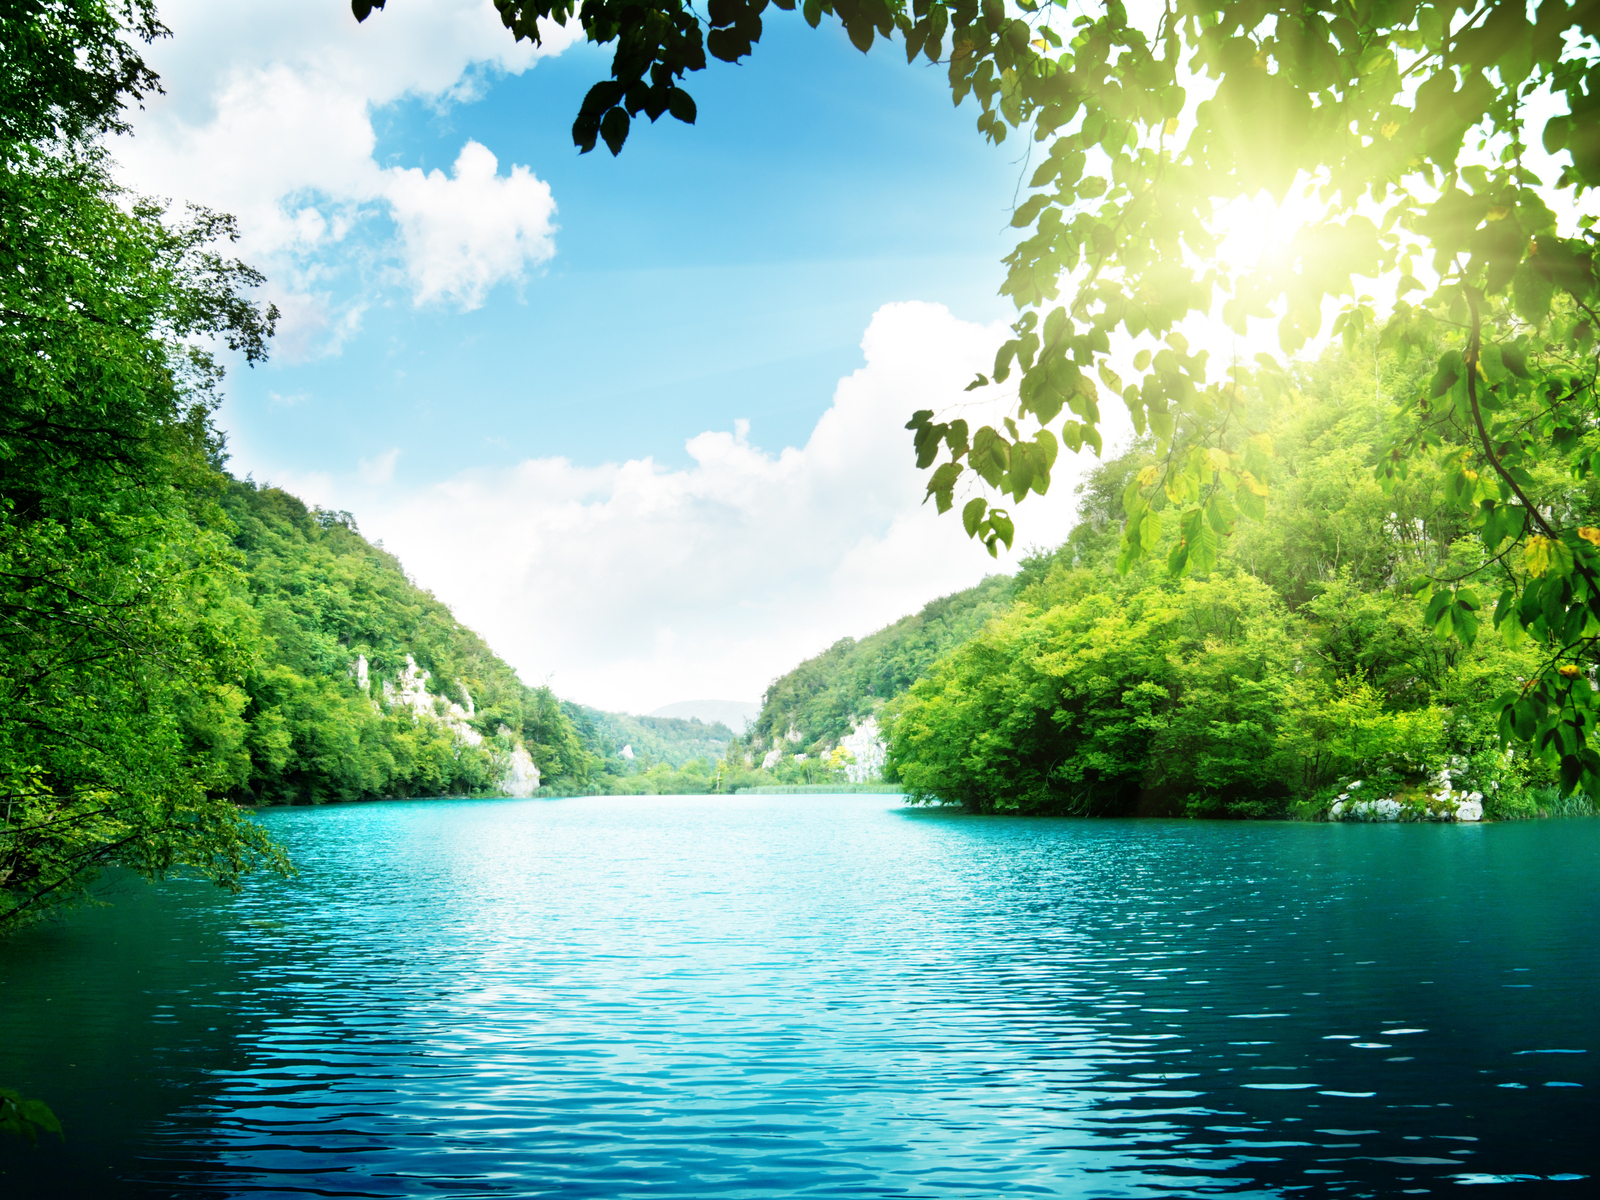 sunshine between leaves green mountains hd wallpaper hd